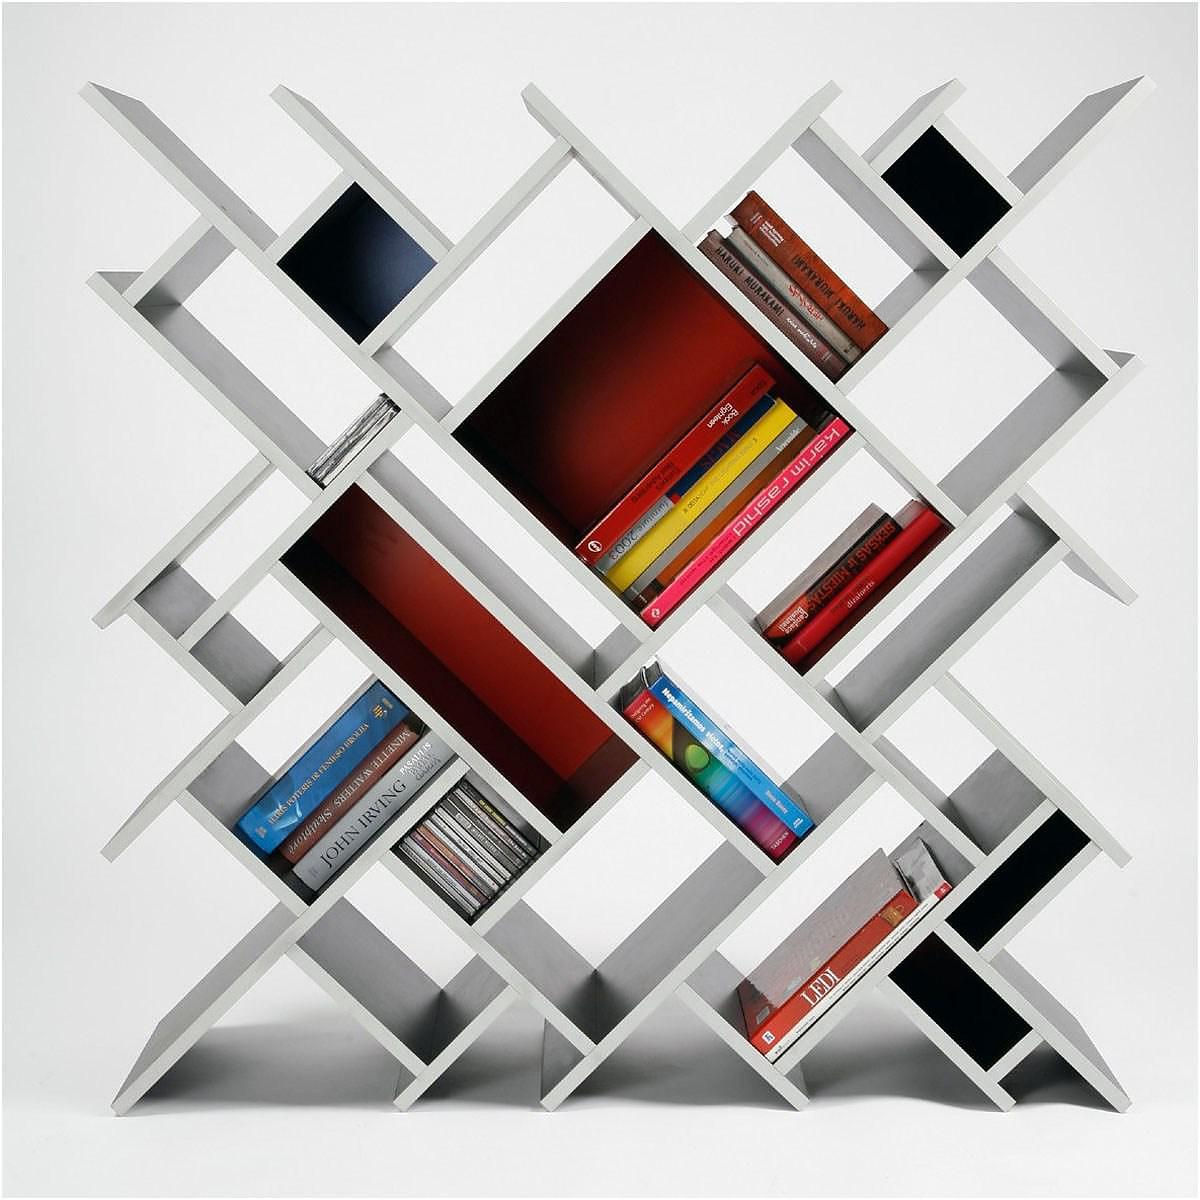 Our Criss Cross Bookshelf Has a Slanted Bookshelf Design. The Slant  Bookshelf Is an Ideal